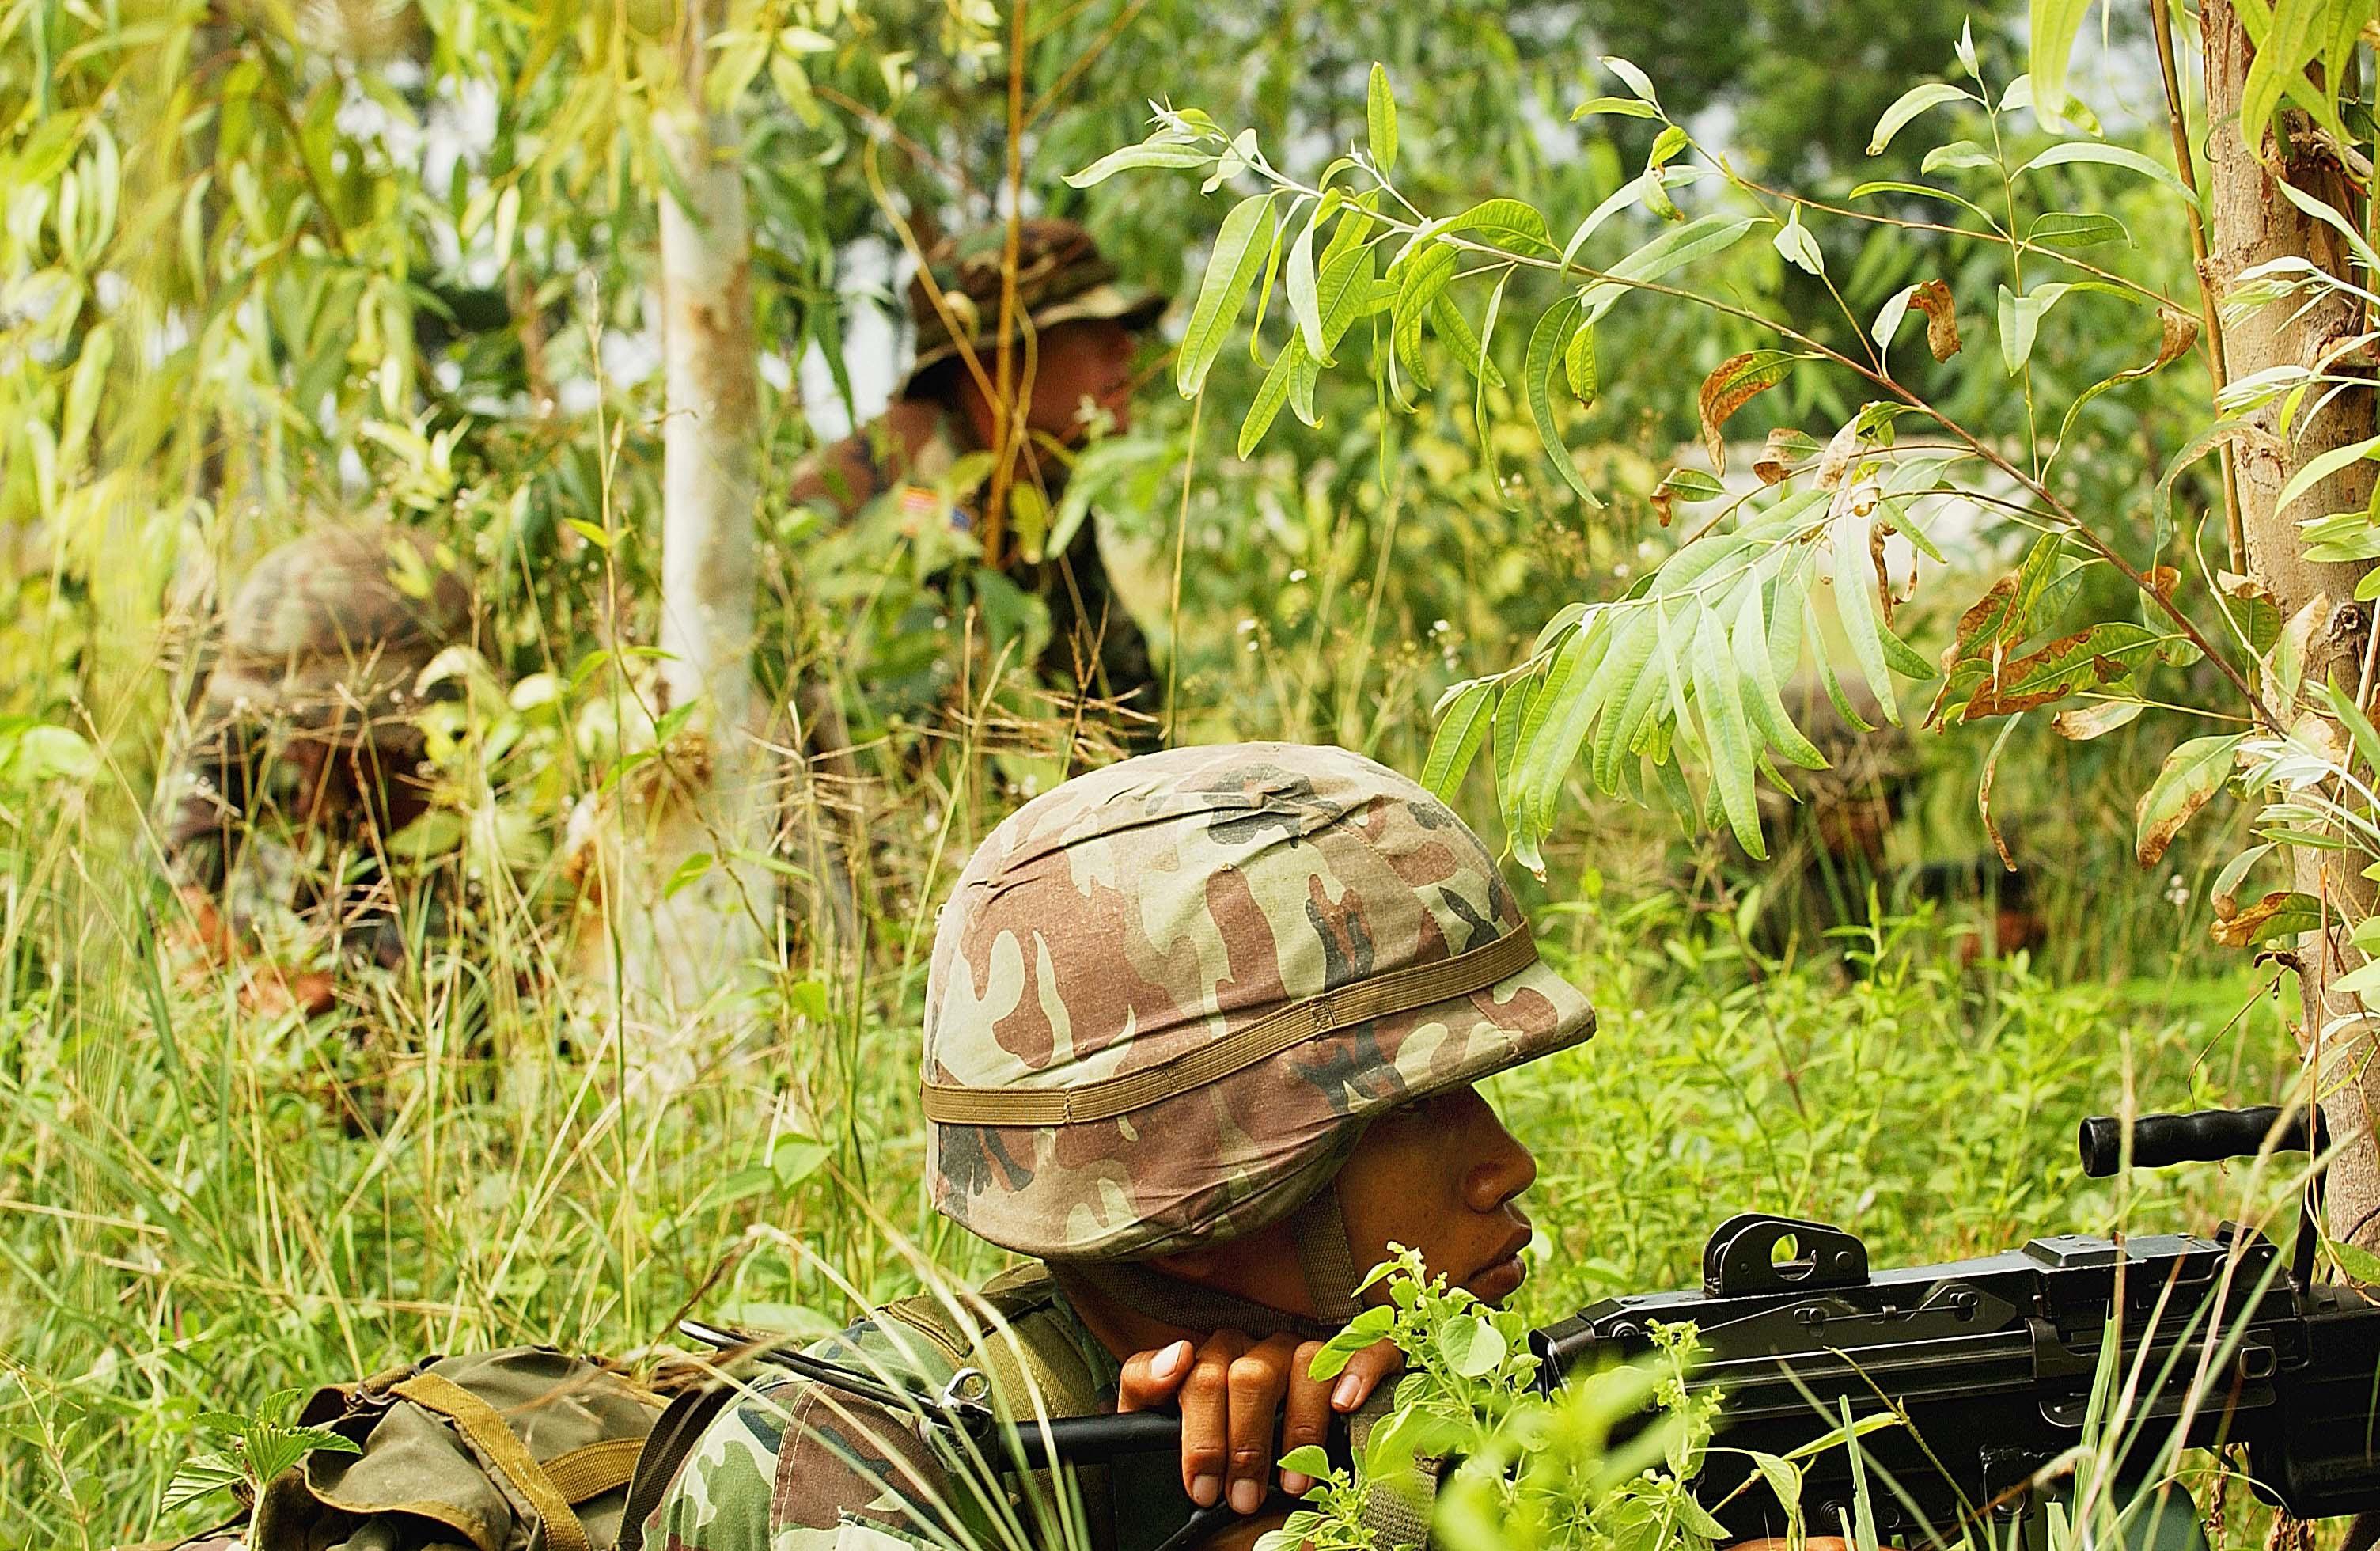 Soldiers needed ahead of Thai exodus